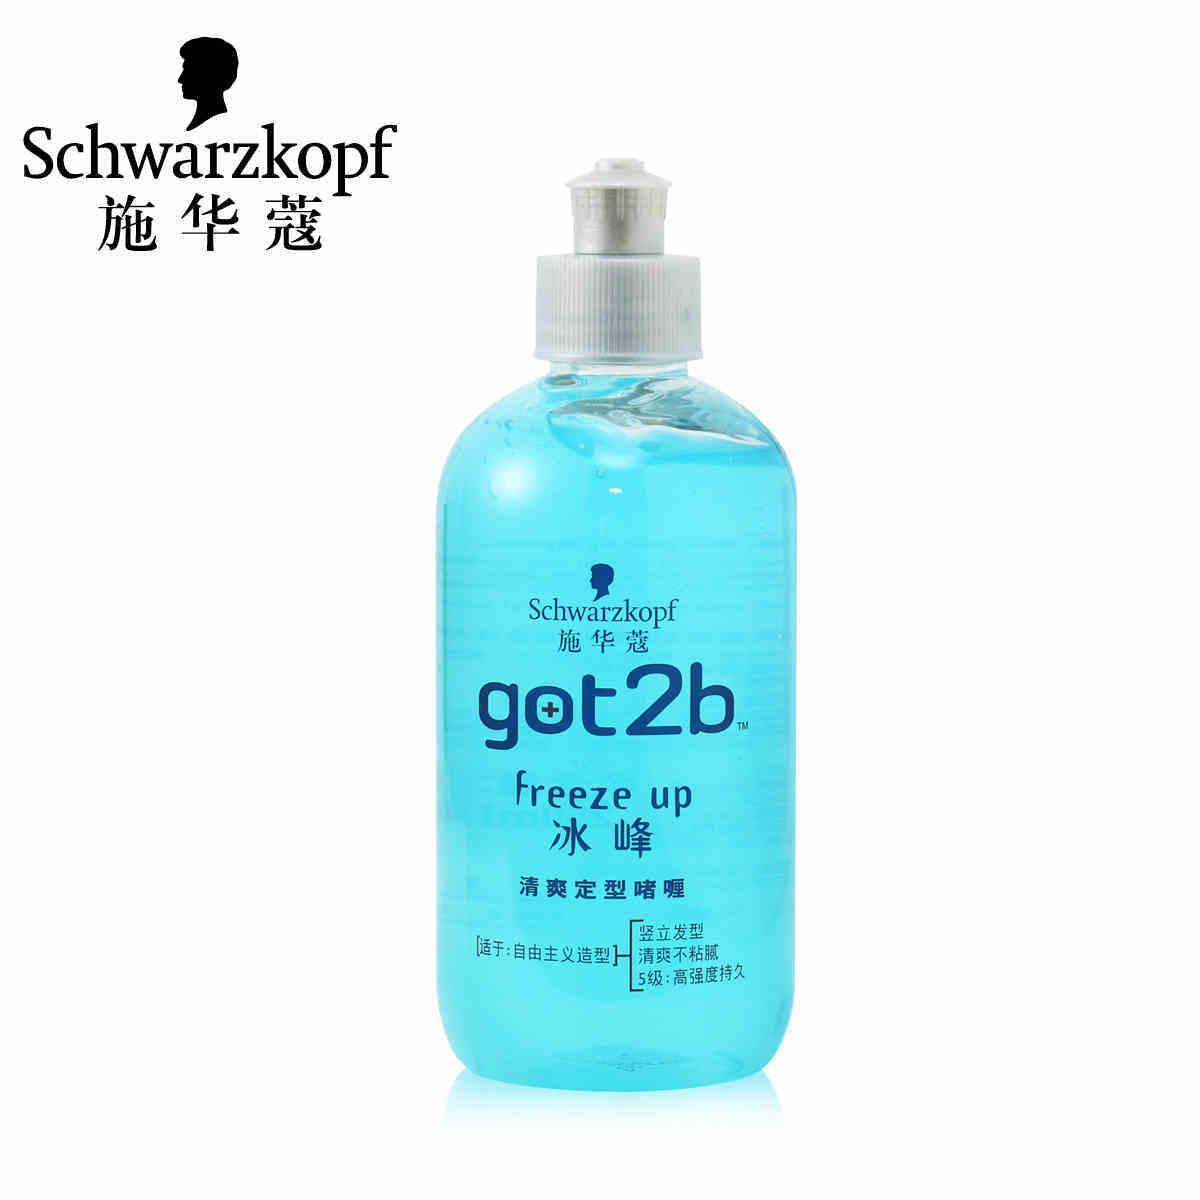 Schwarzkopf 施華蔻 冰峰清爽定型啫喱